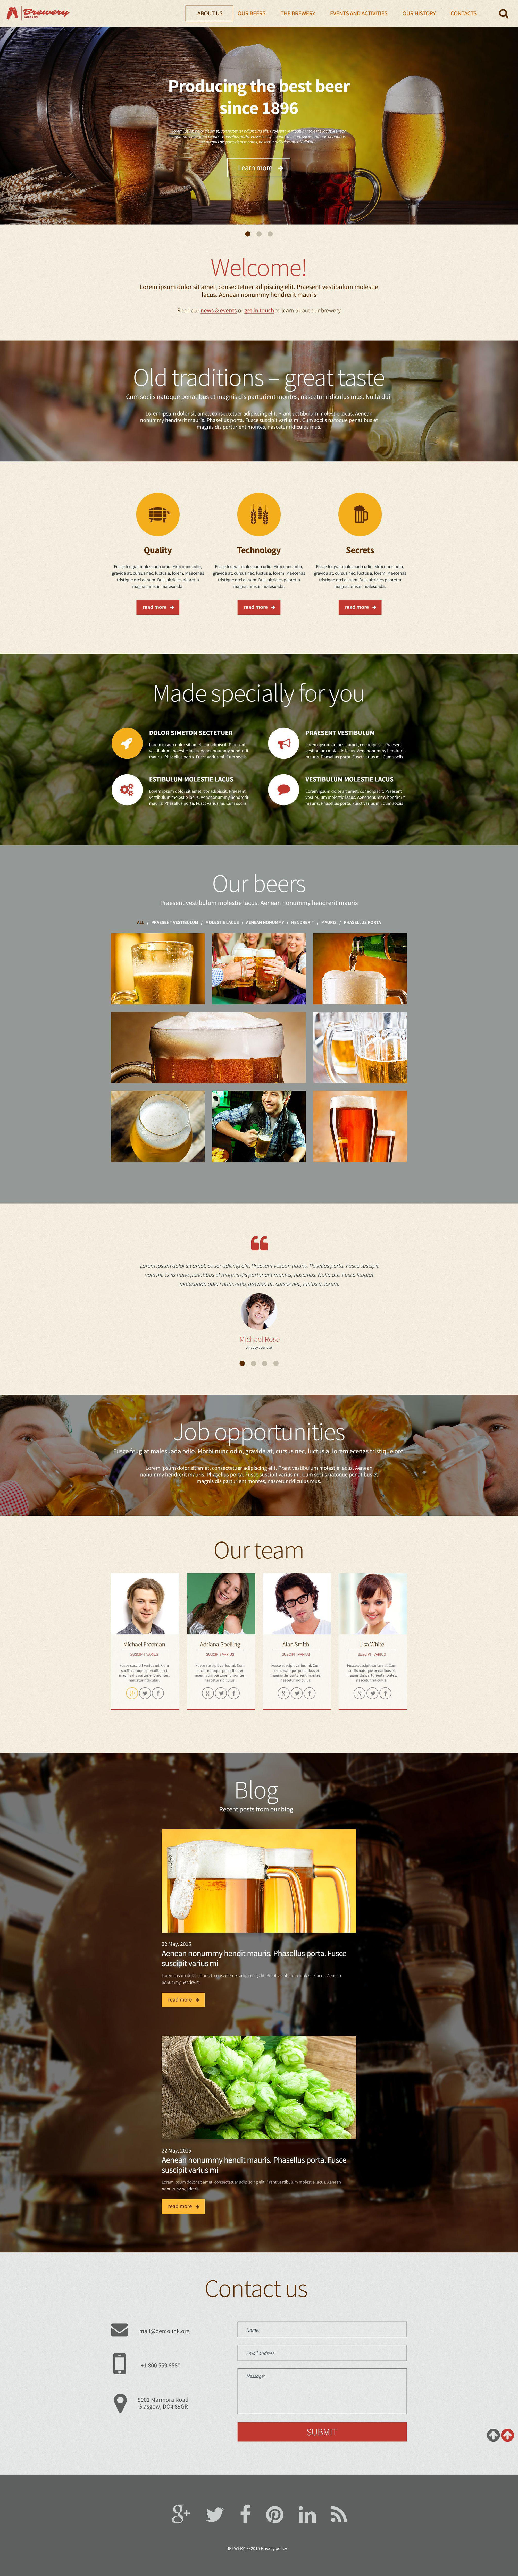 "WordPress Theme namens ""Brauerei"" #55486"